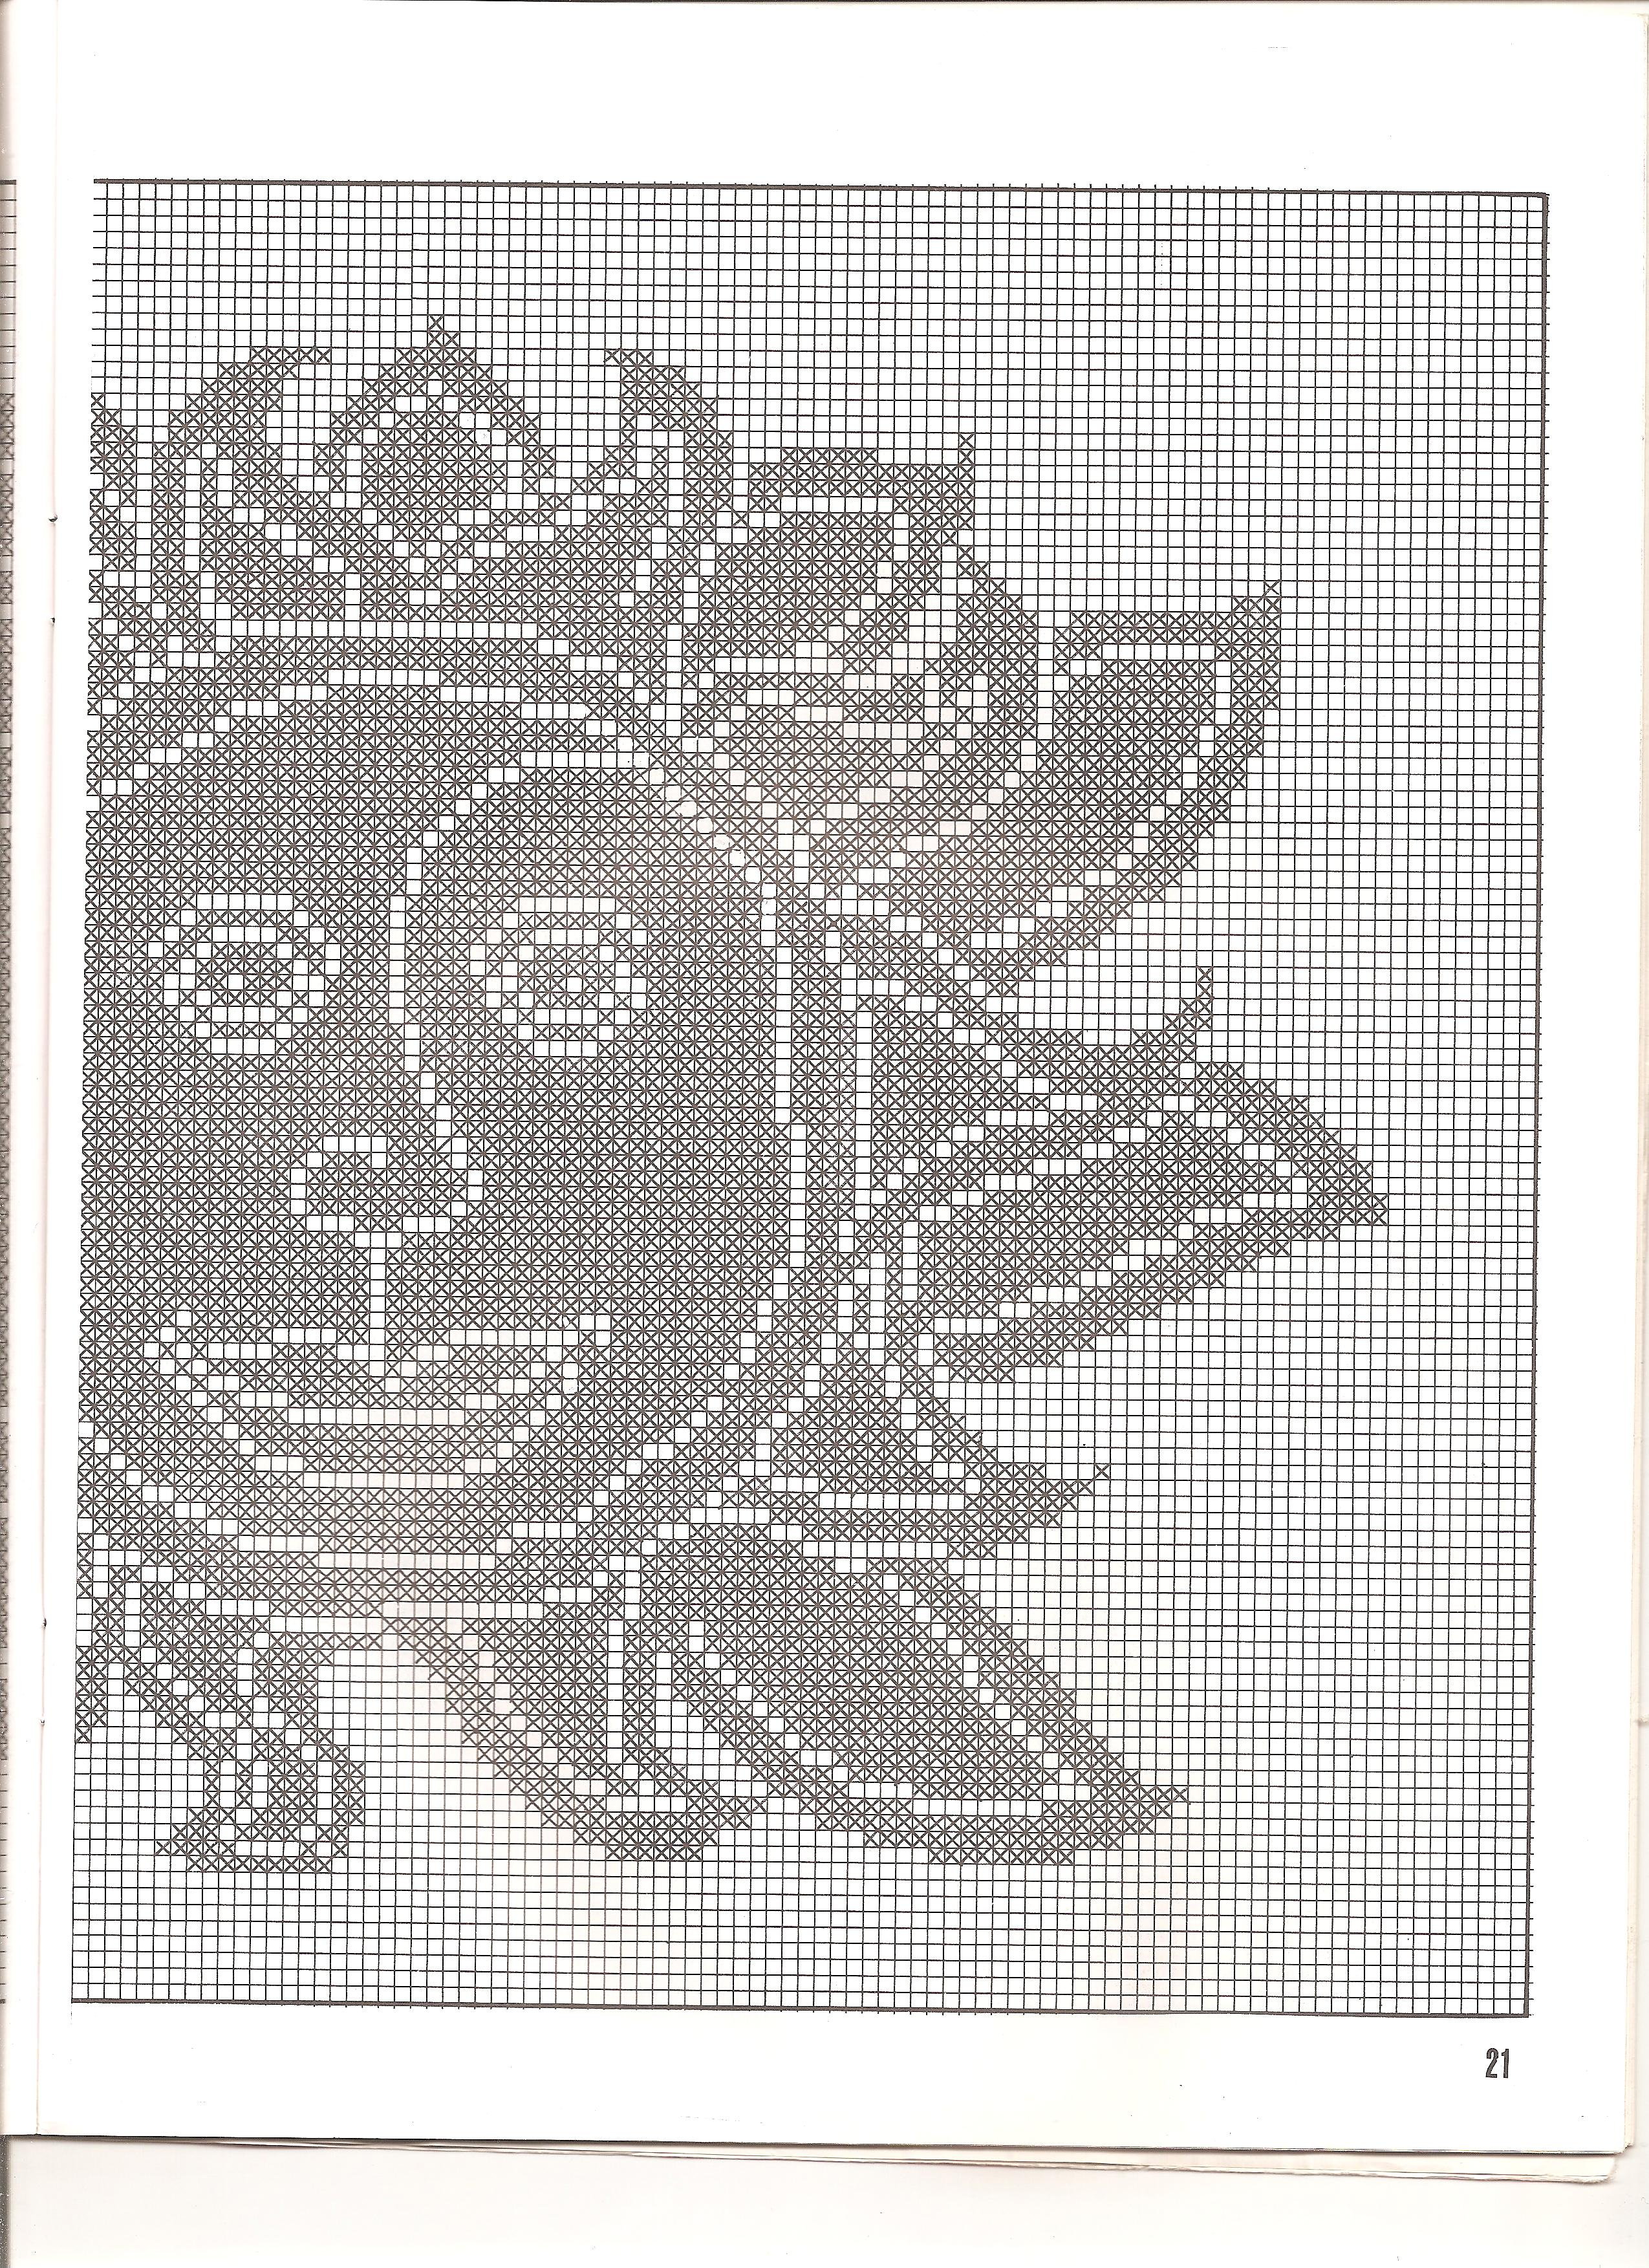 Bruce Dragonfly The Ami Amigurumi Crochet Pattern / schema | Etsy | 3507x2550